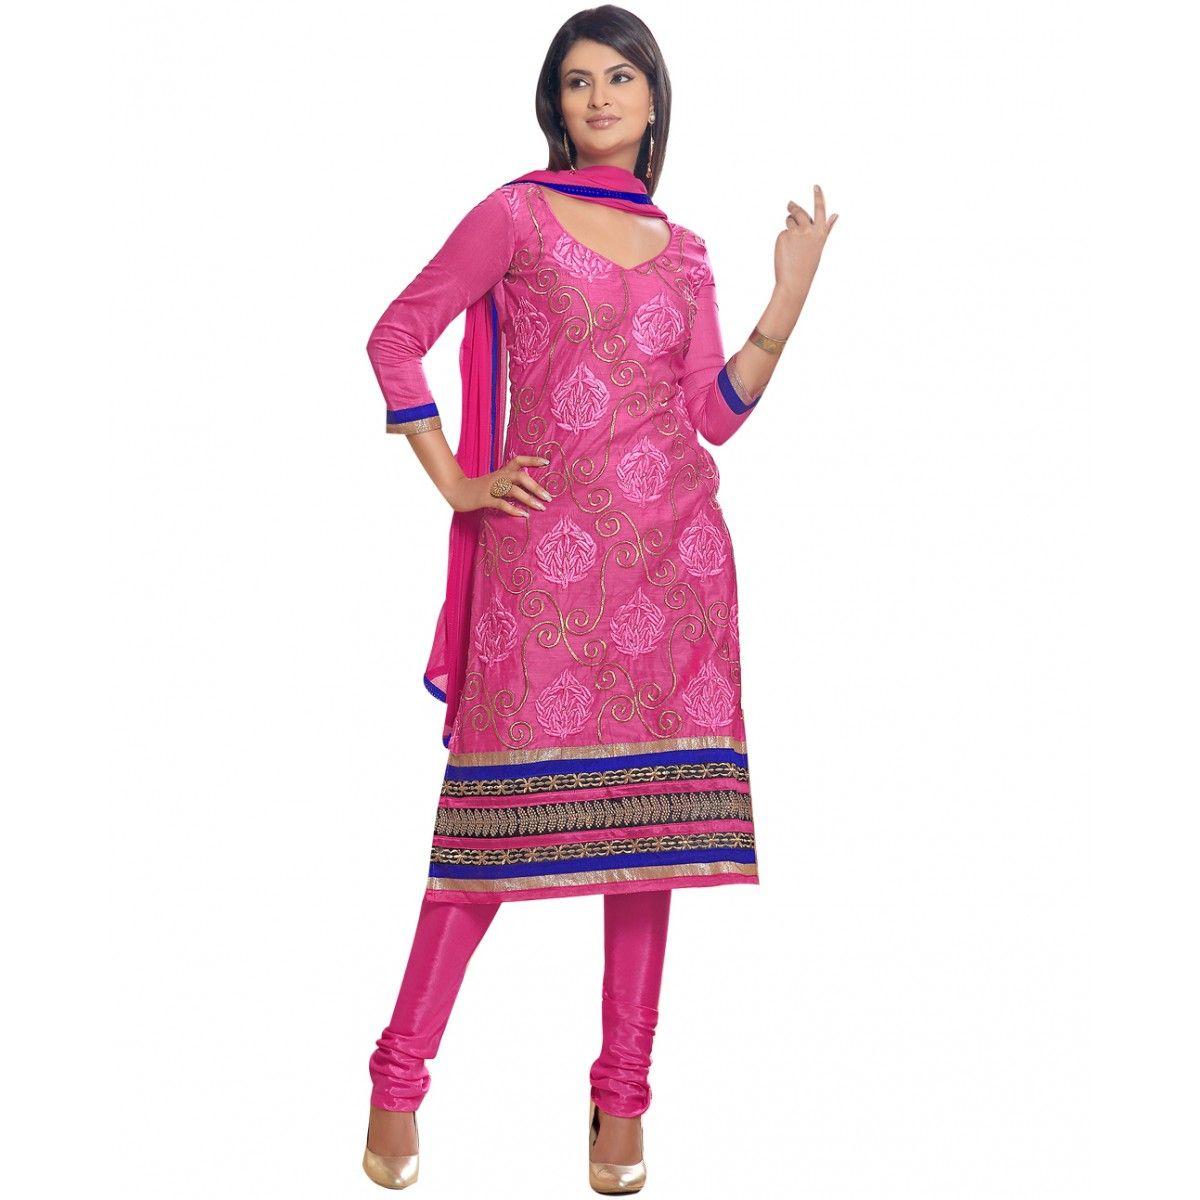 World's Most Selling Sohani Pink color Laces Salvar Suit